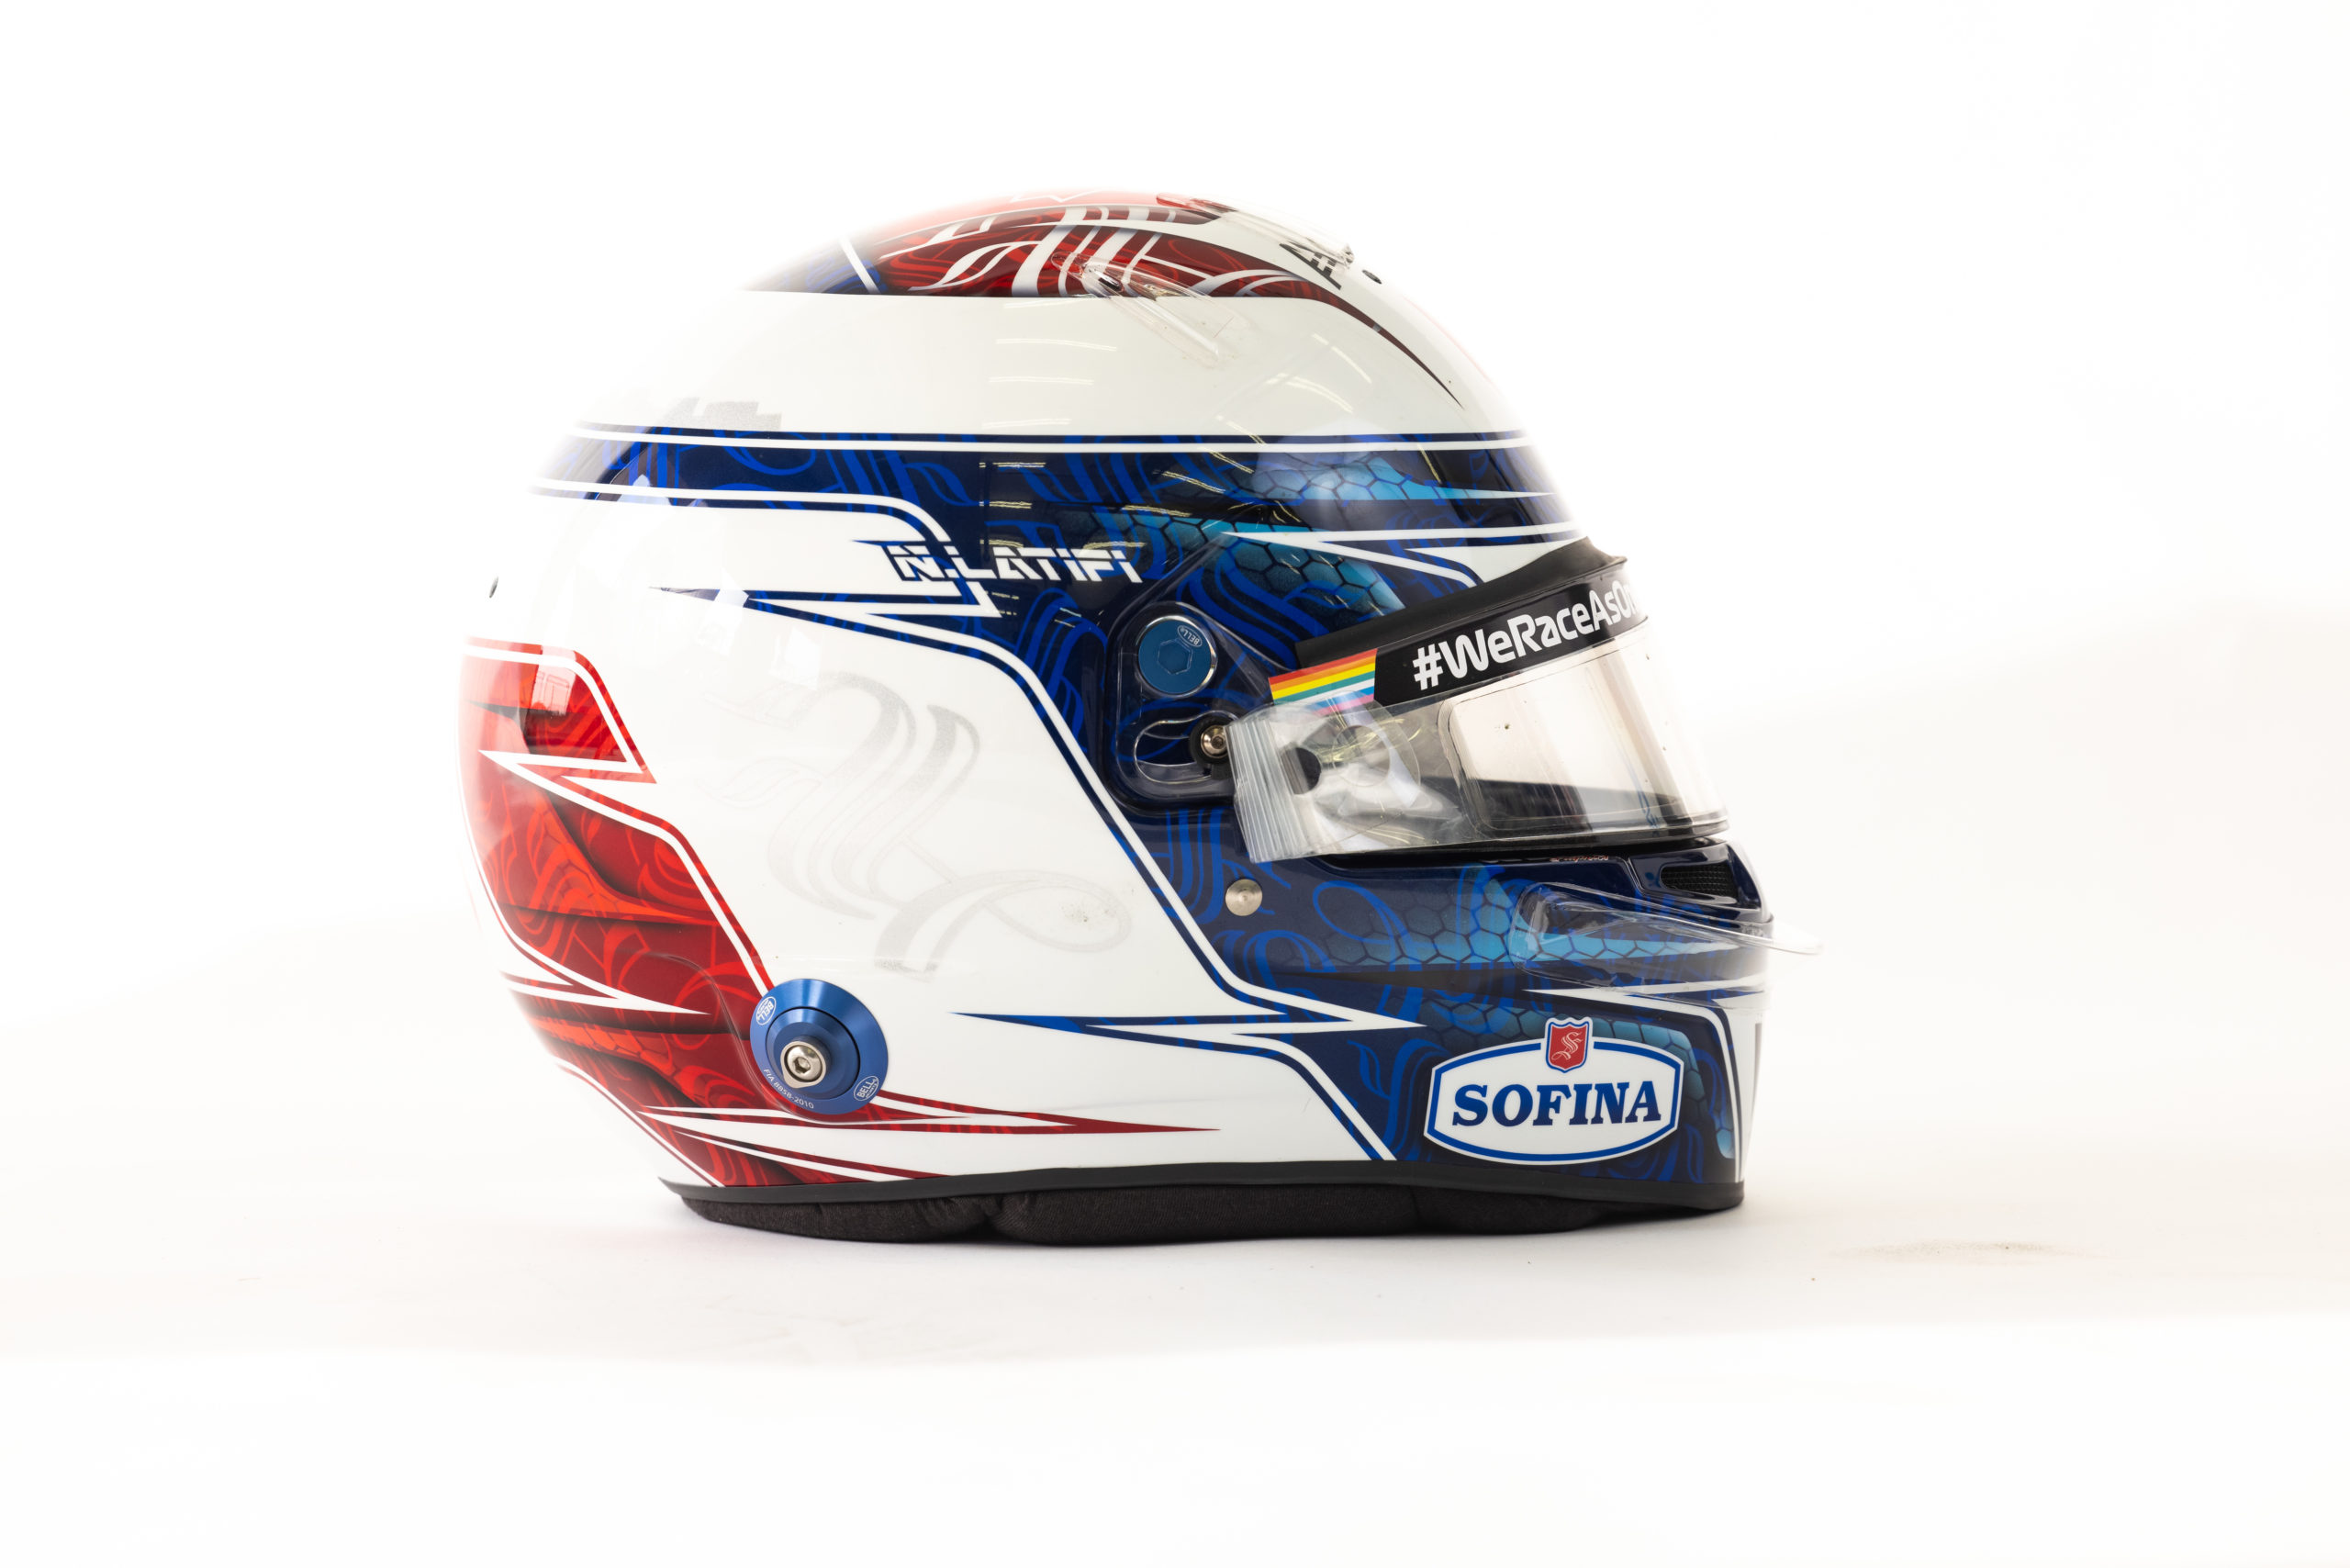 Formel 1 Helm 2021 Latifi